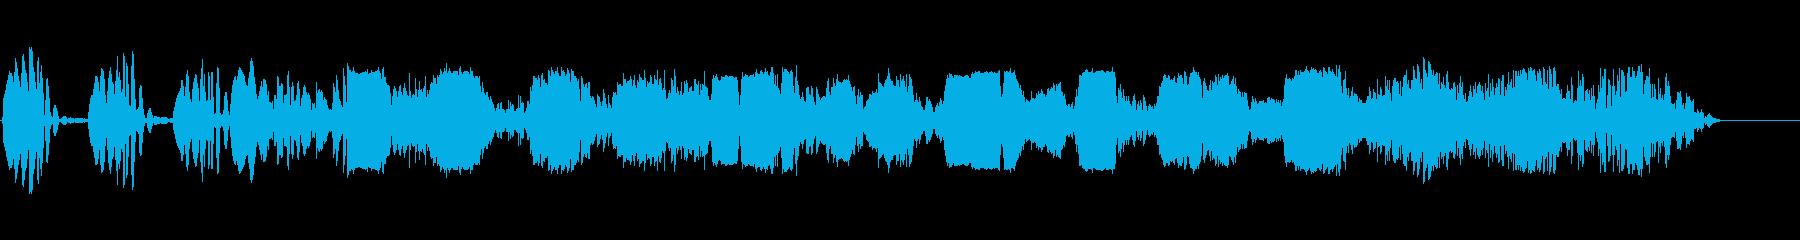 ZapAccents EC09_42_3の再生済みの波形